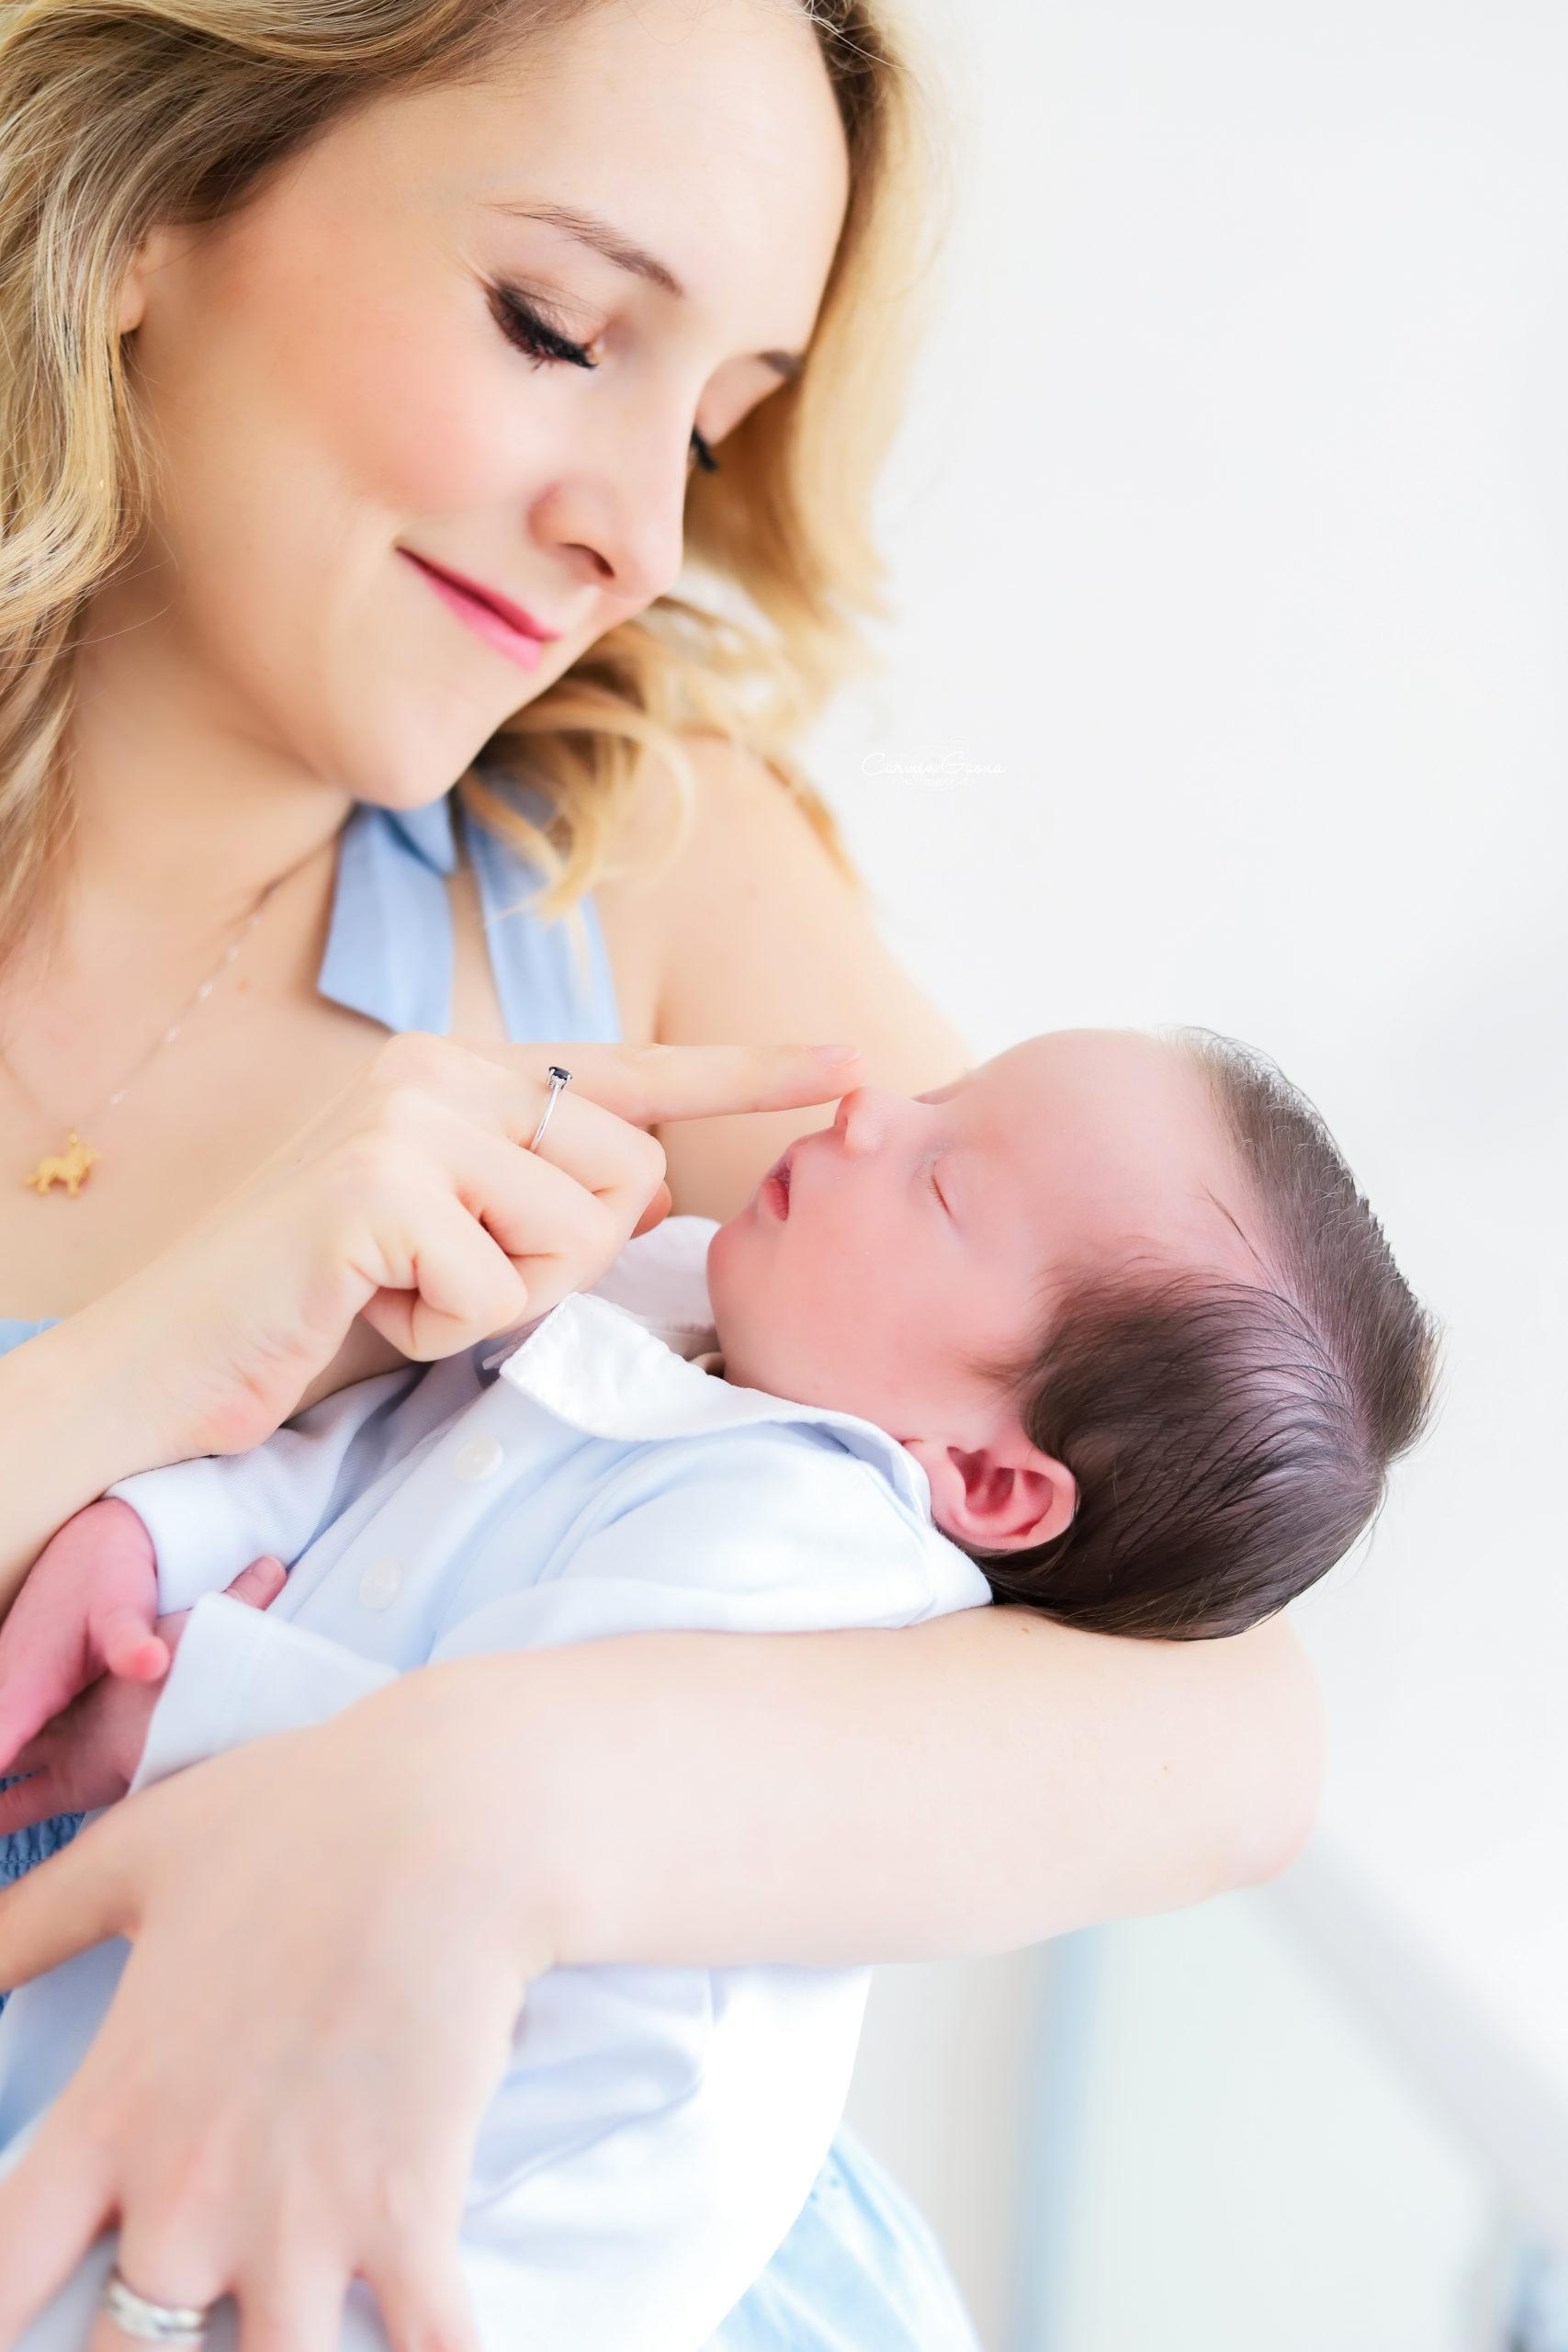 Lucas Daniel con su mamá.